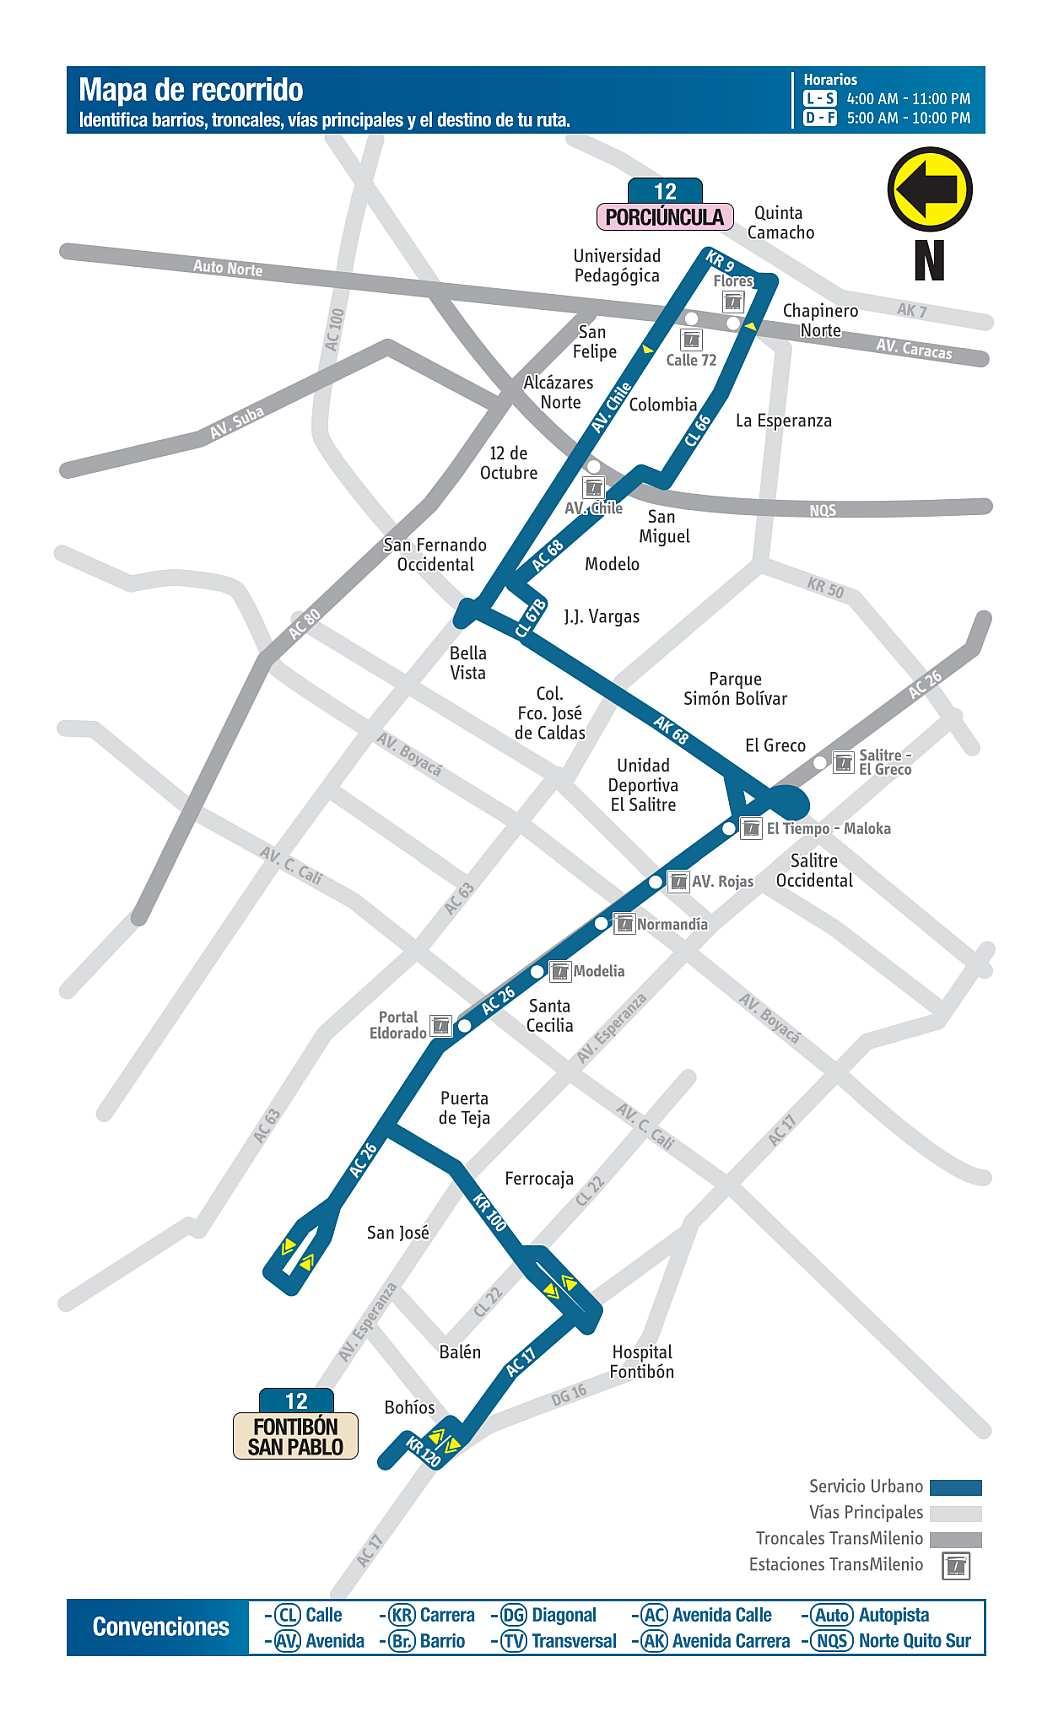 Mapa bus urbano 12 Fontibón San Pablo - Porciúncula